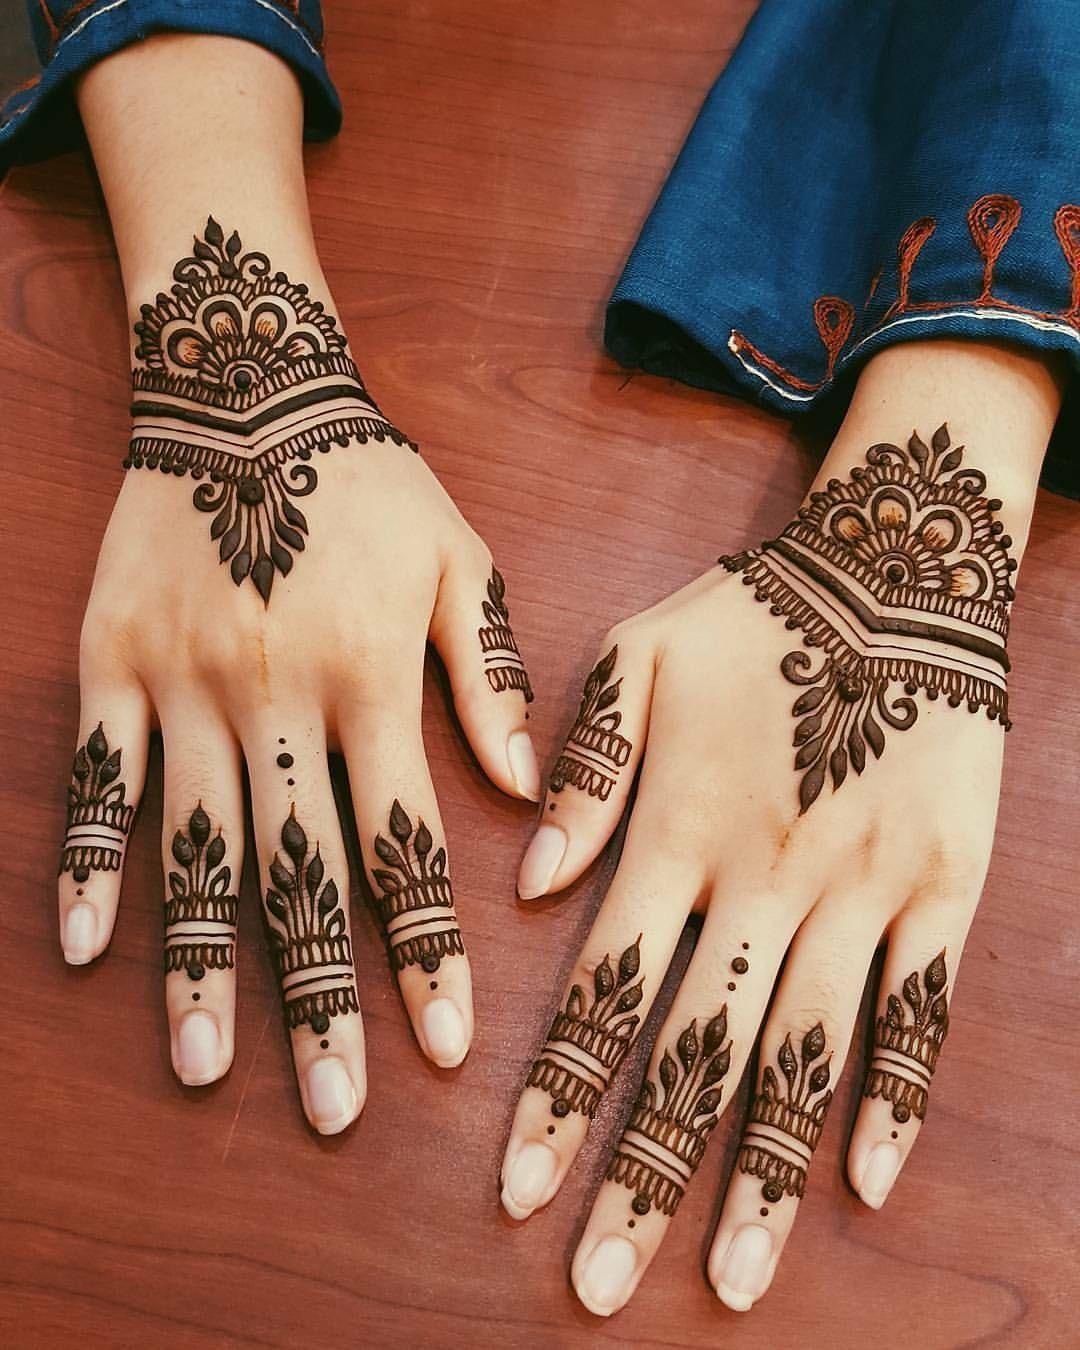 Pin By A Za On Henna Tattoos Mehndi Henna Designs Henna